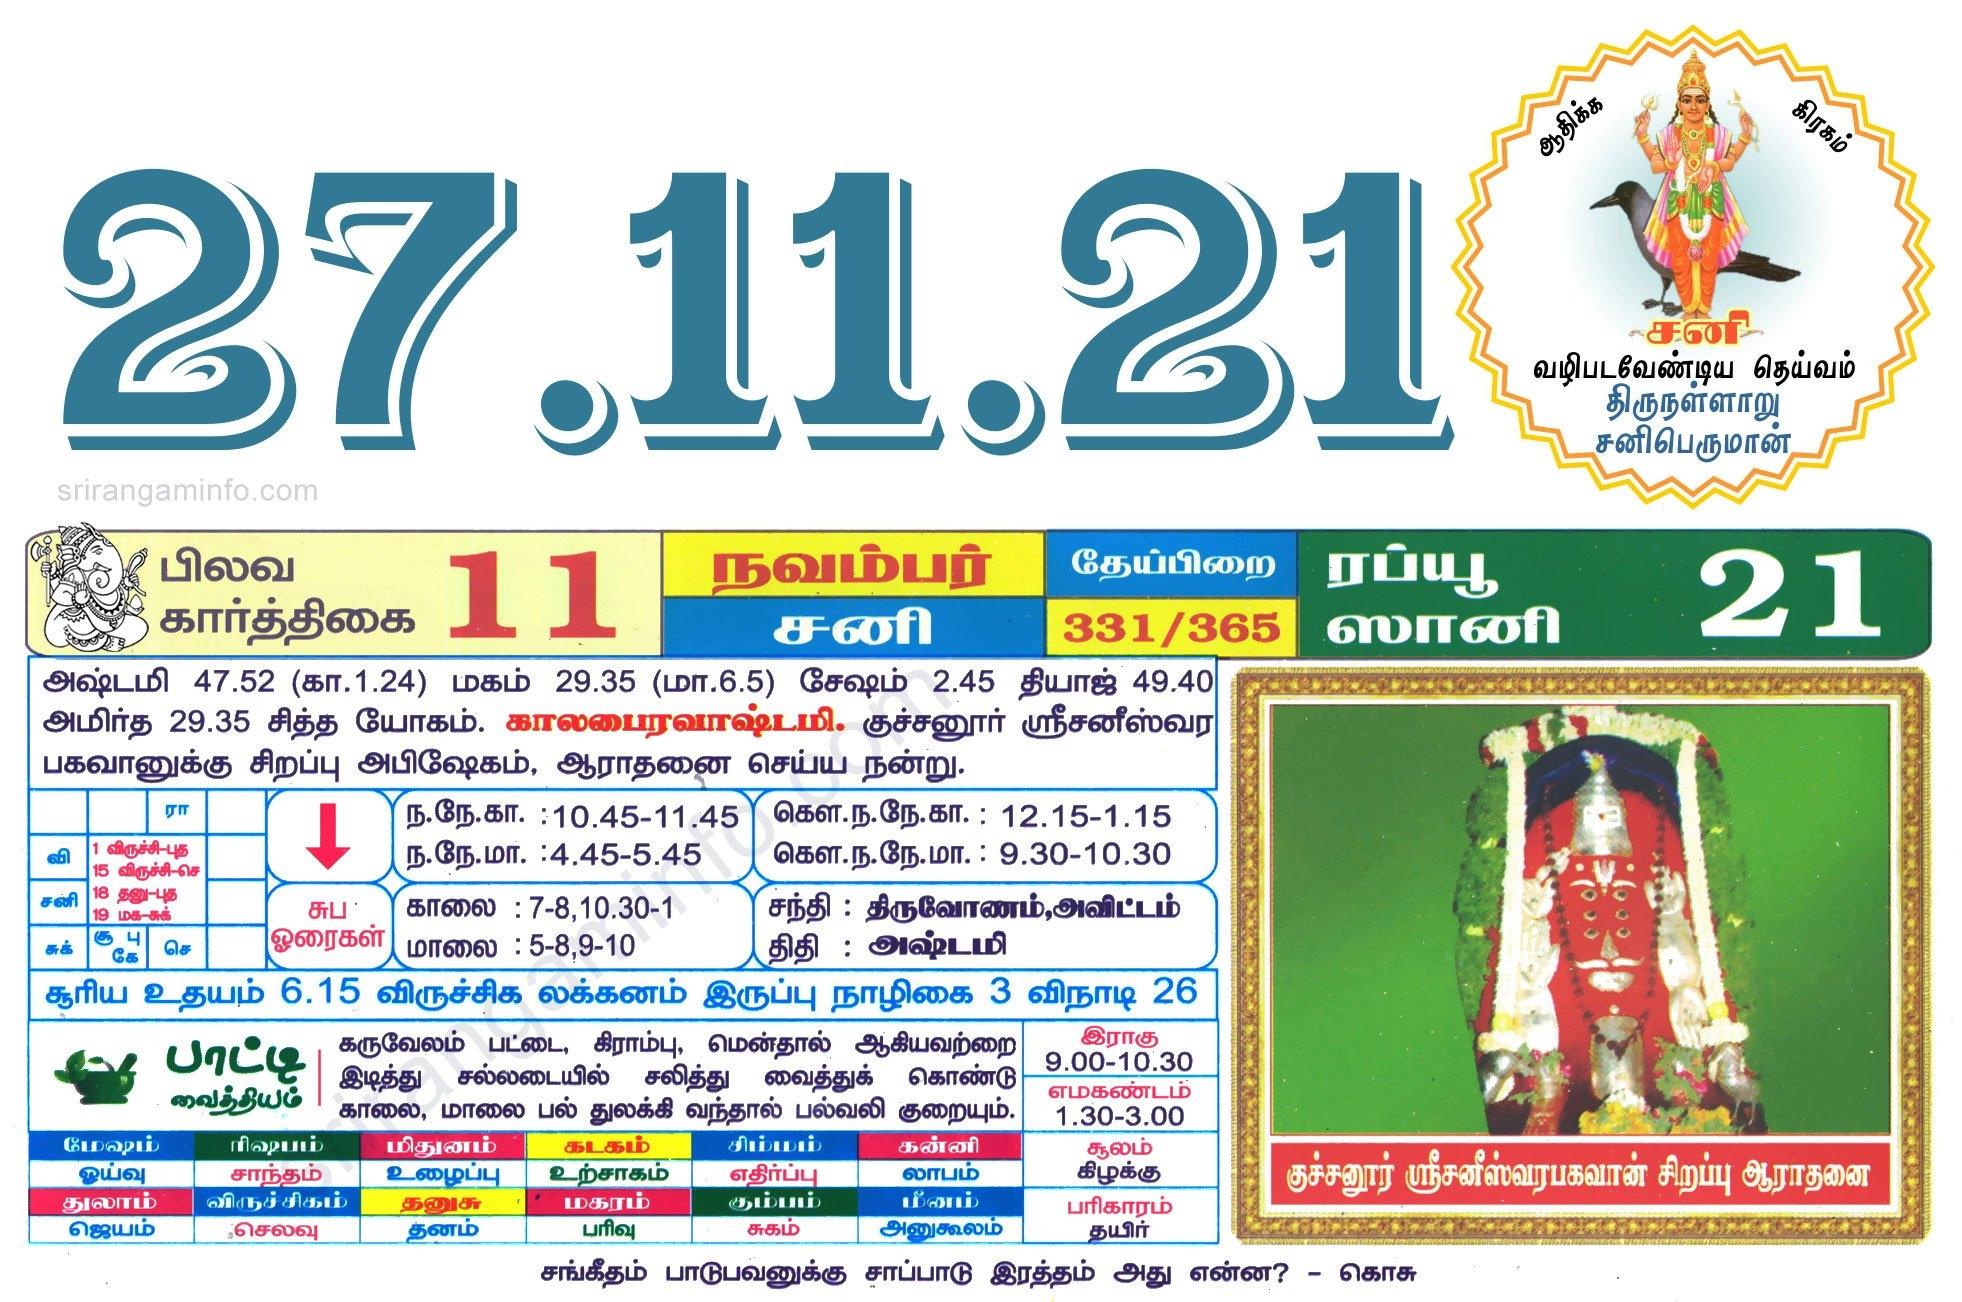 Tamil Monthly Calendar 2021, Tamil Calendar 2021 To 2009 regarding Calender Kuda In Tamil 2021